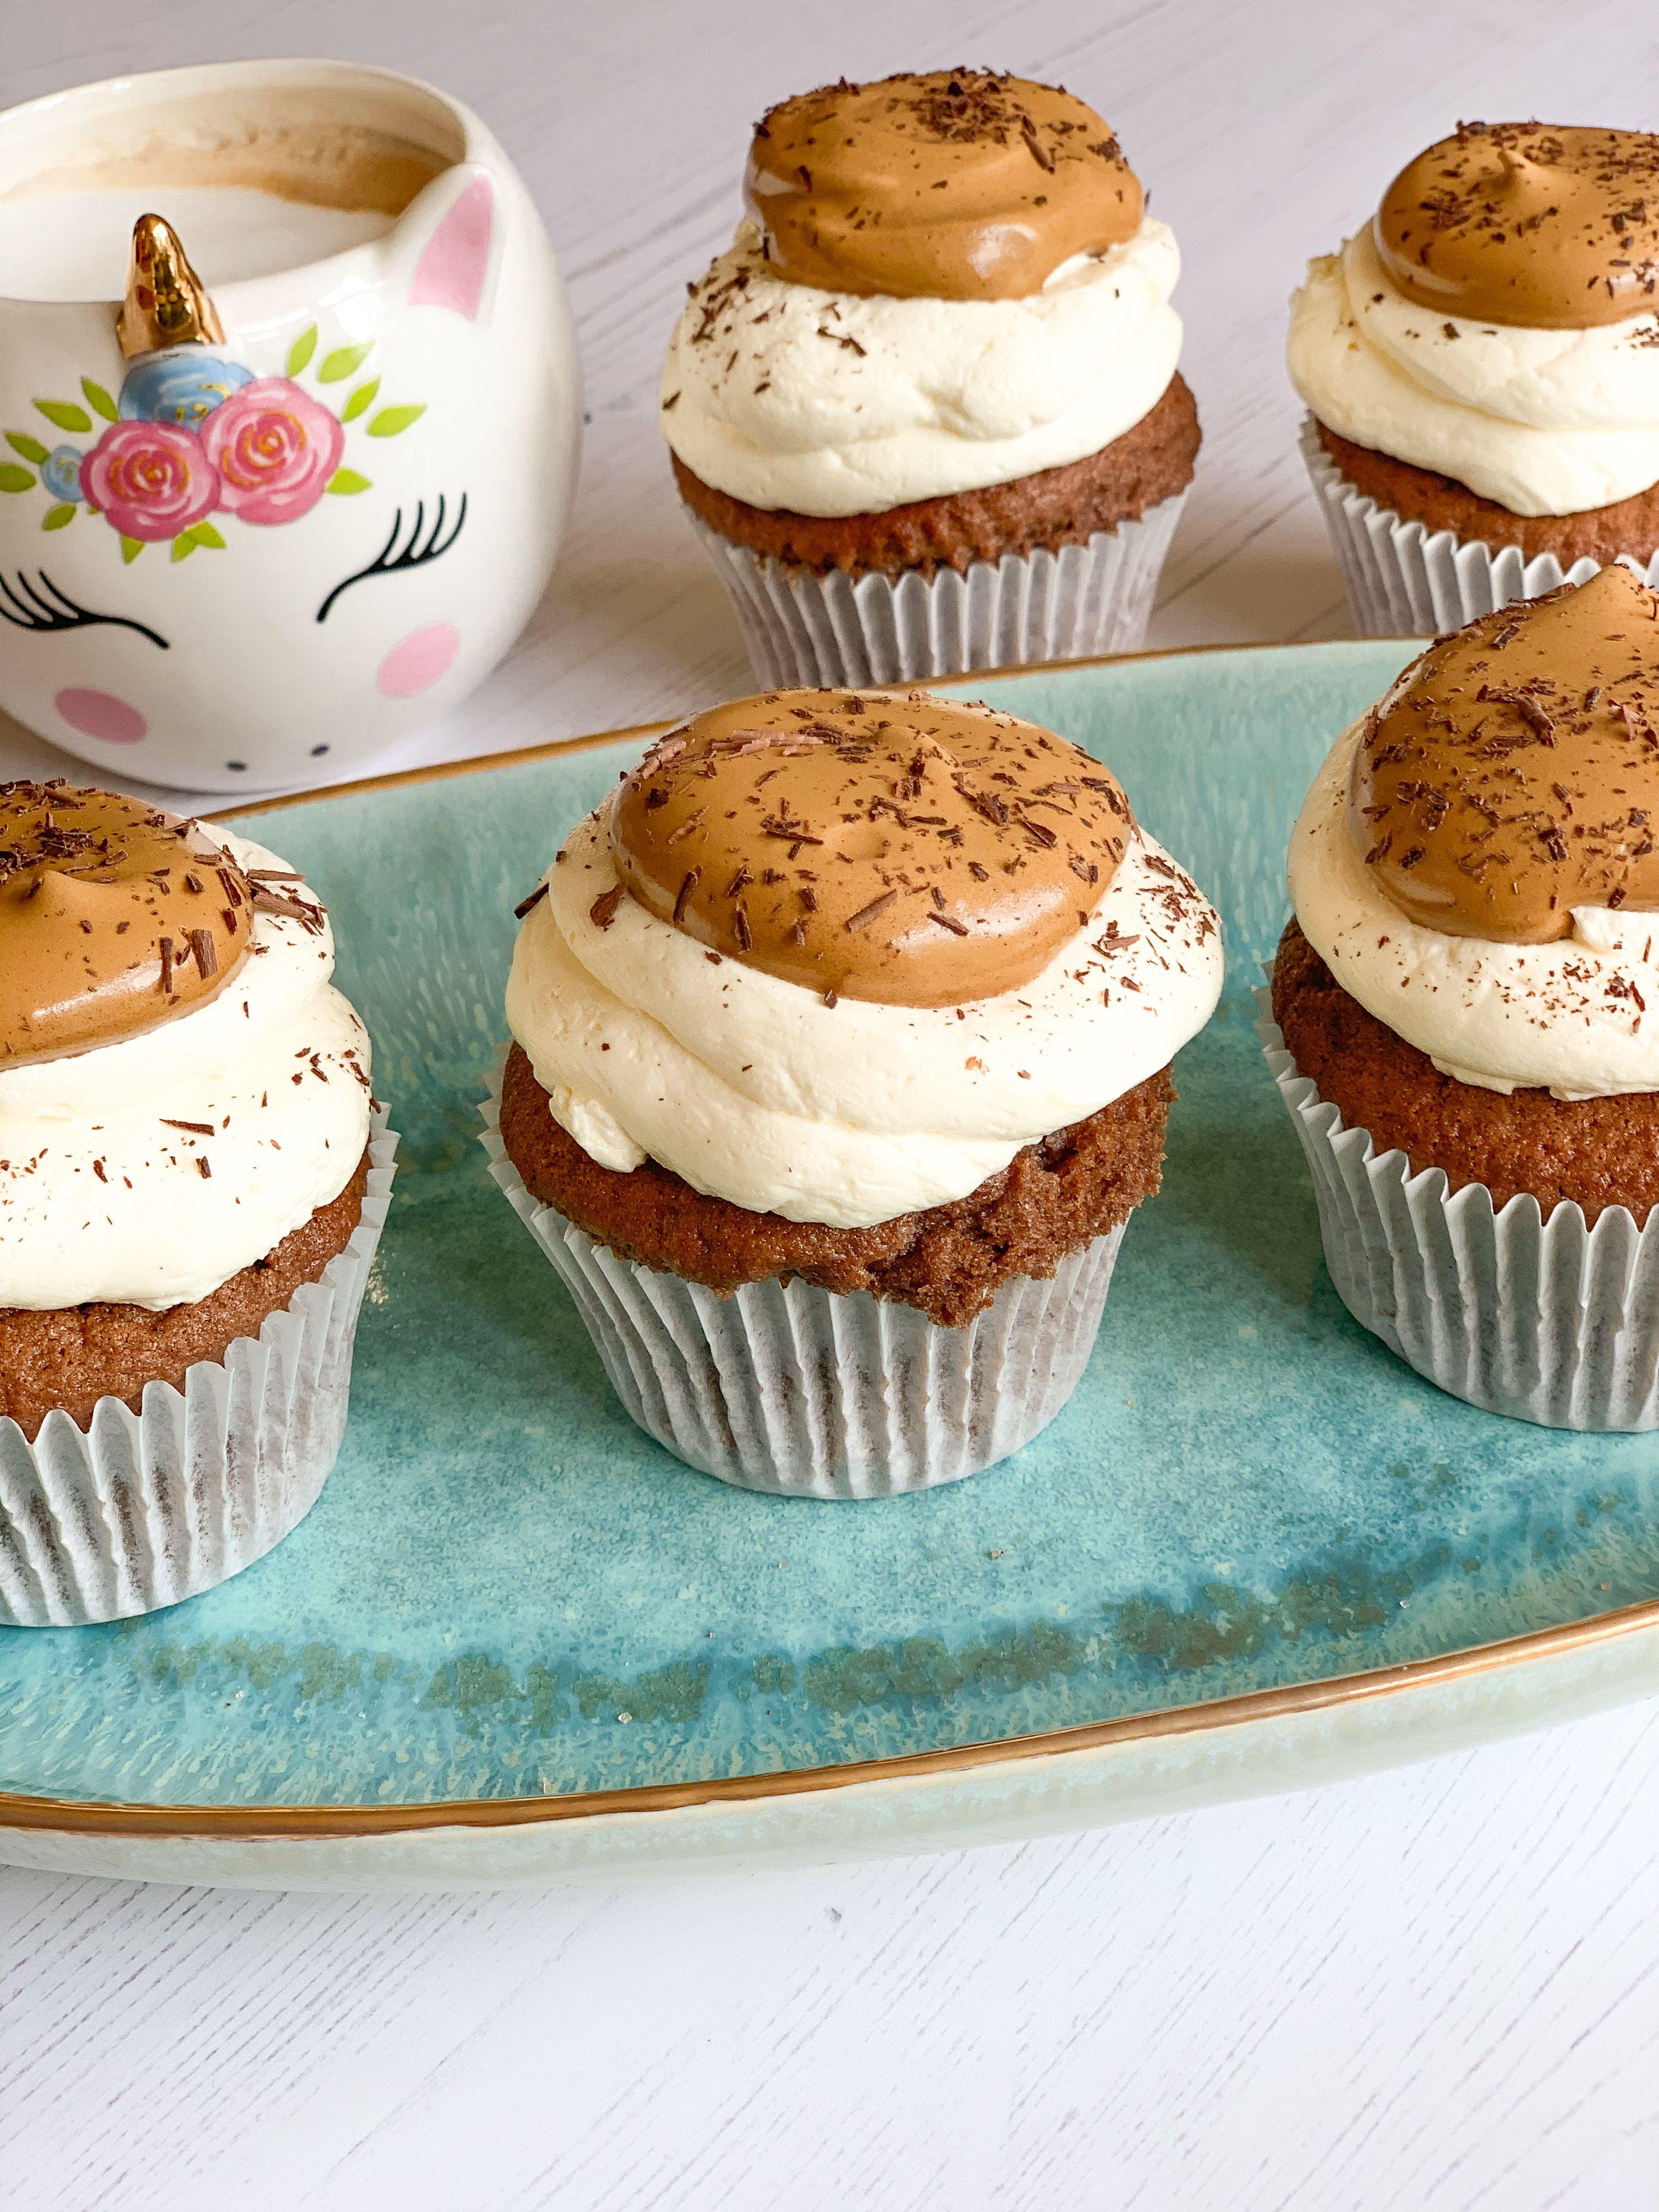 Dalgona Coffee Cupcakes in 2020 Food, Love food, Dessert